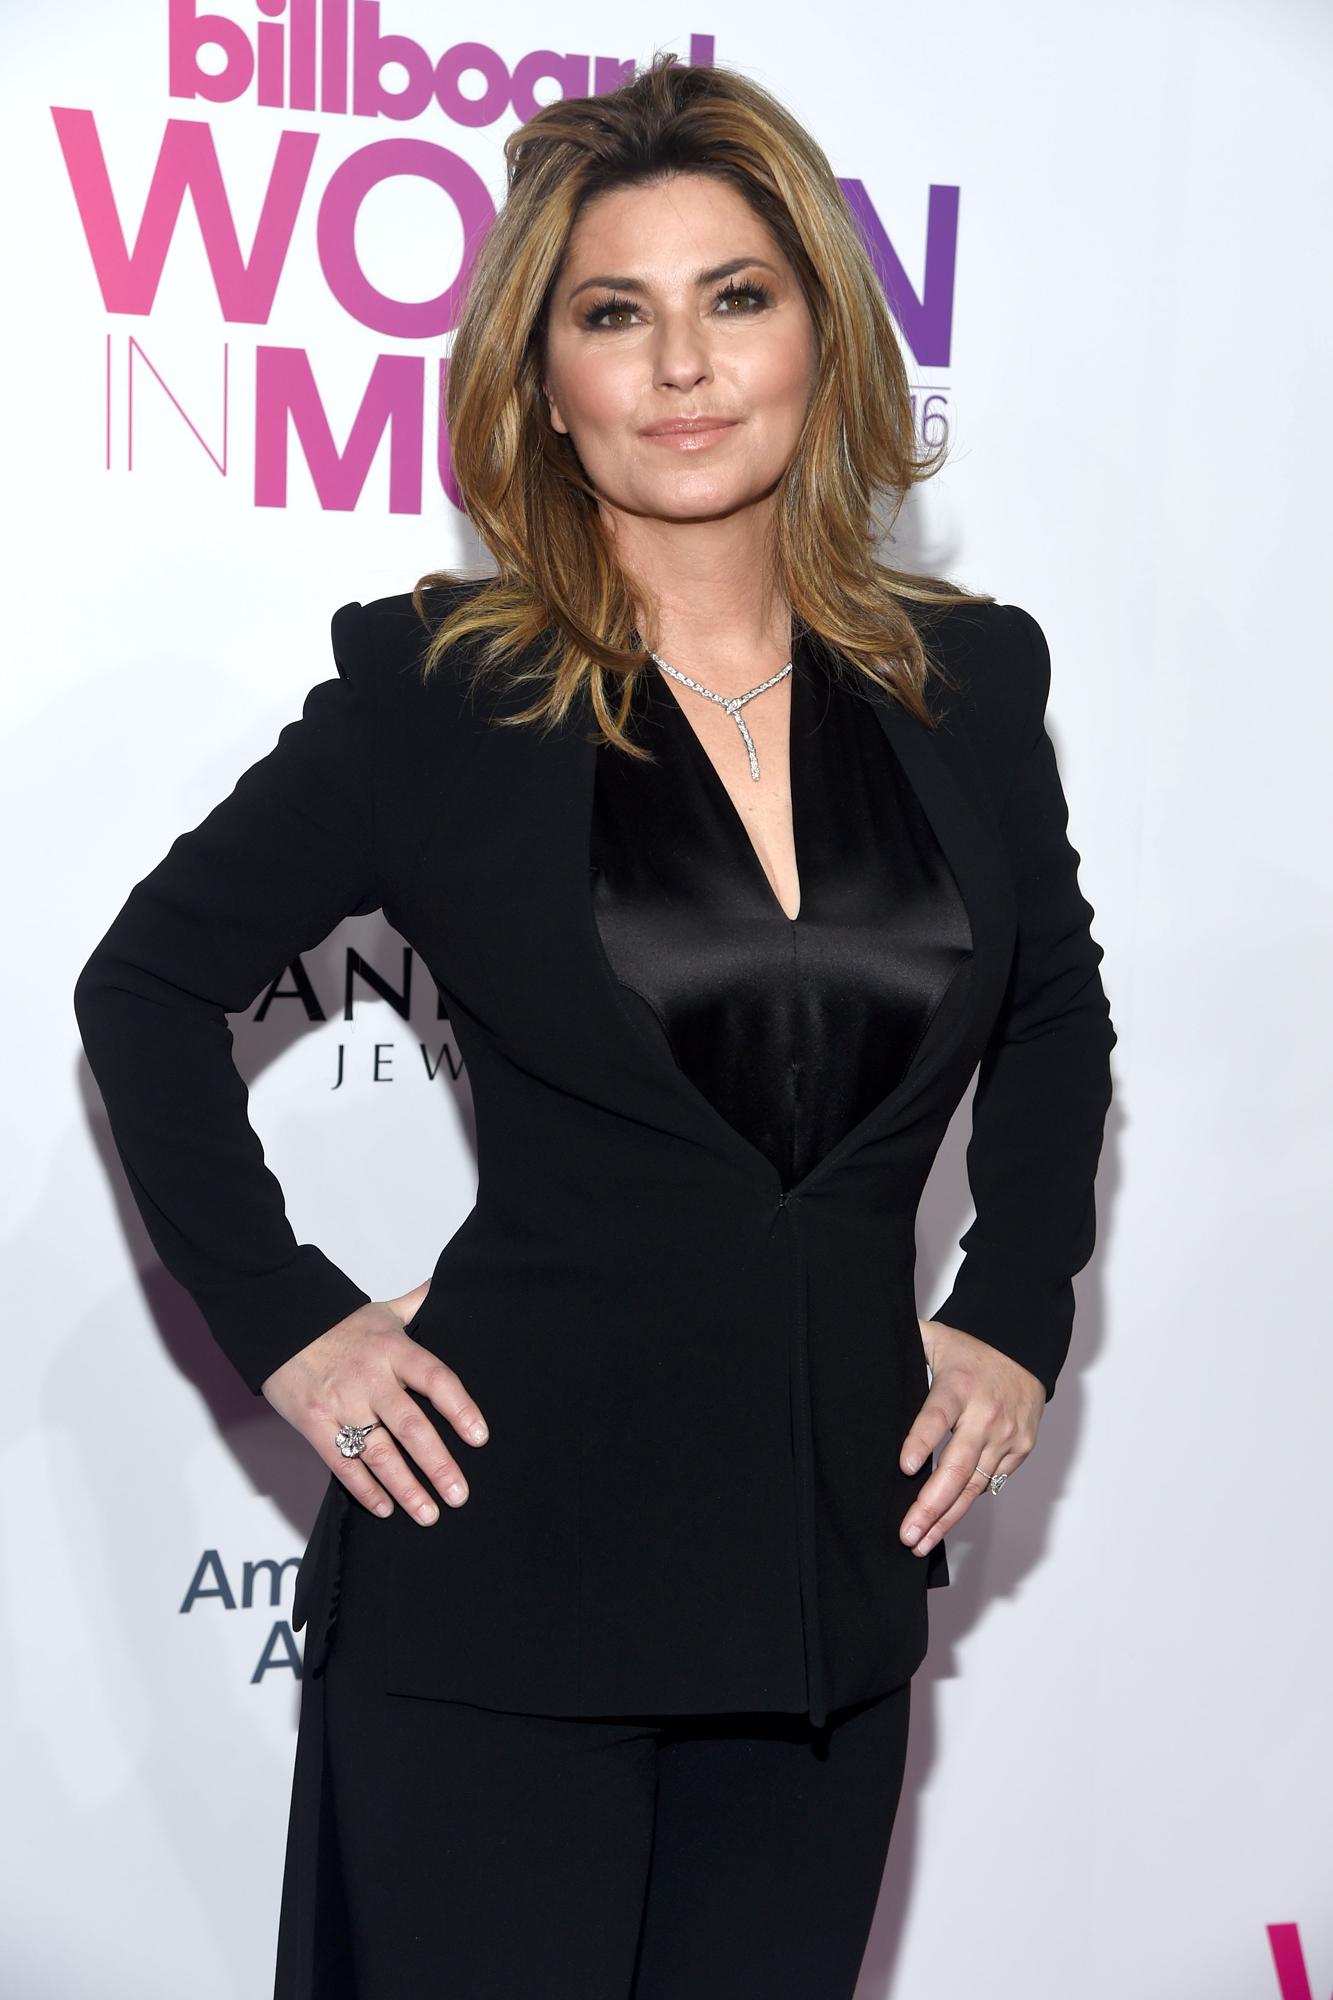 Billboard Women in Music awards, Arrivals, New York, USA - 09 Dec 2016